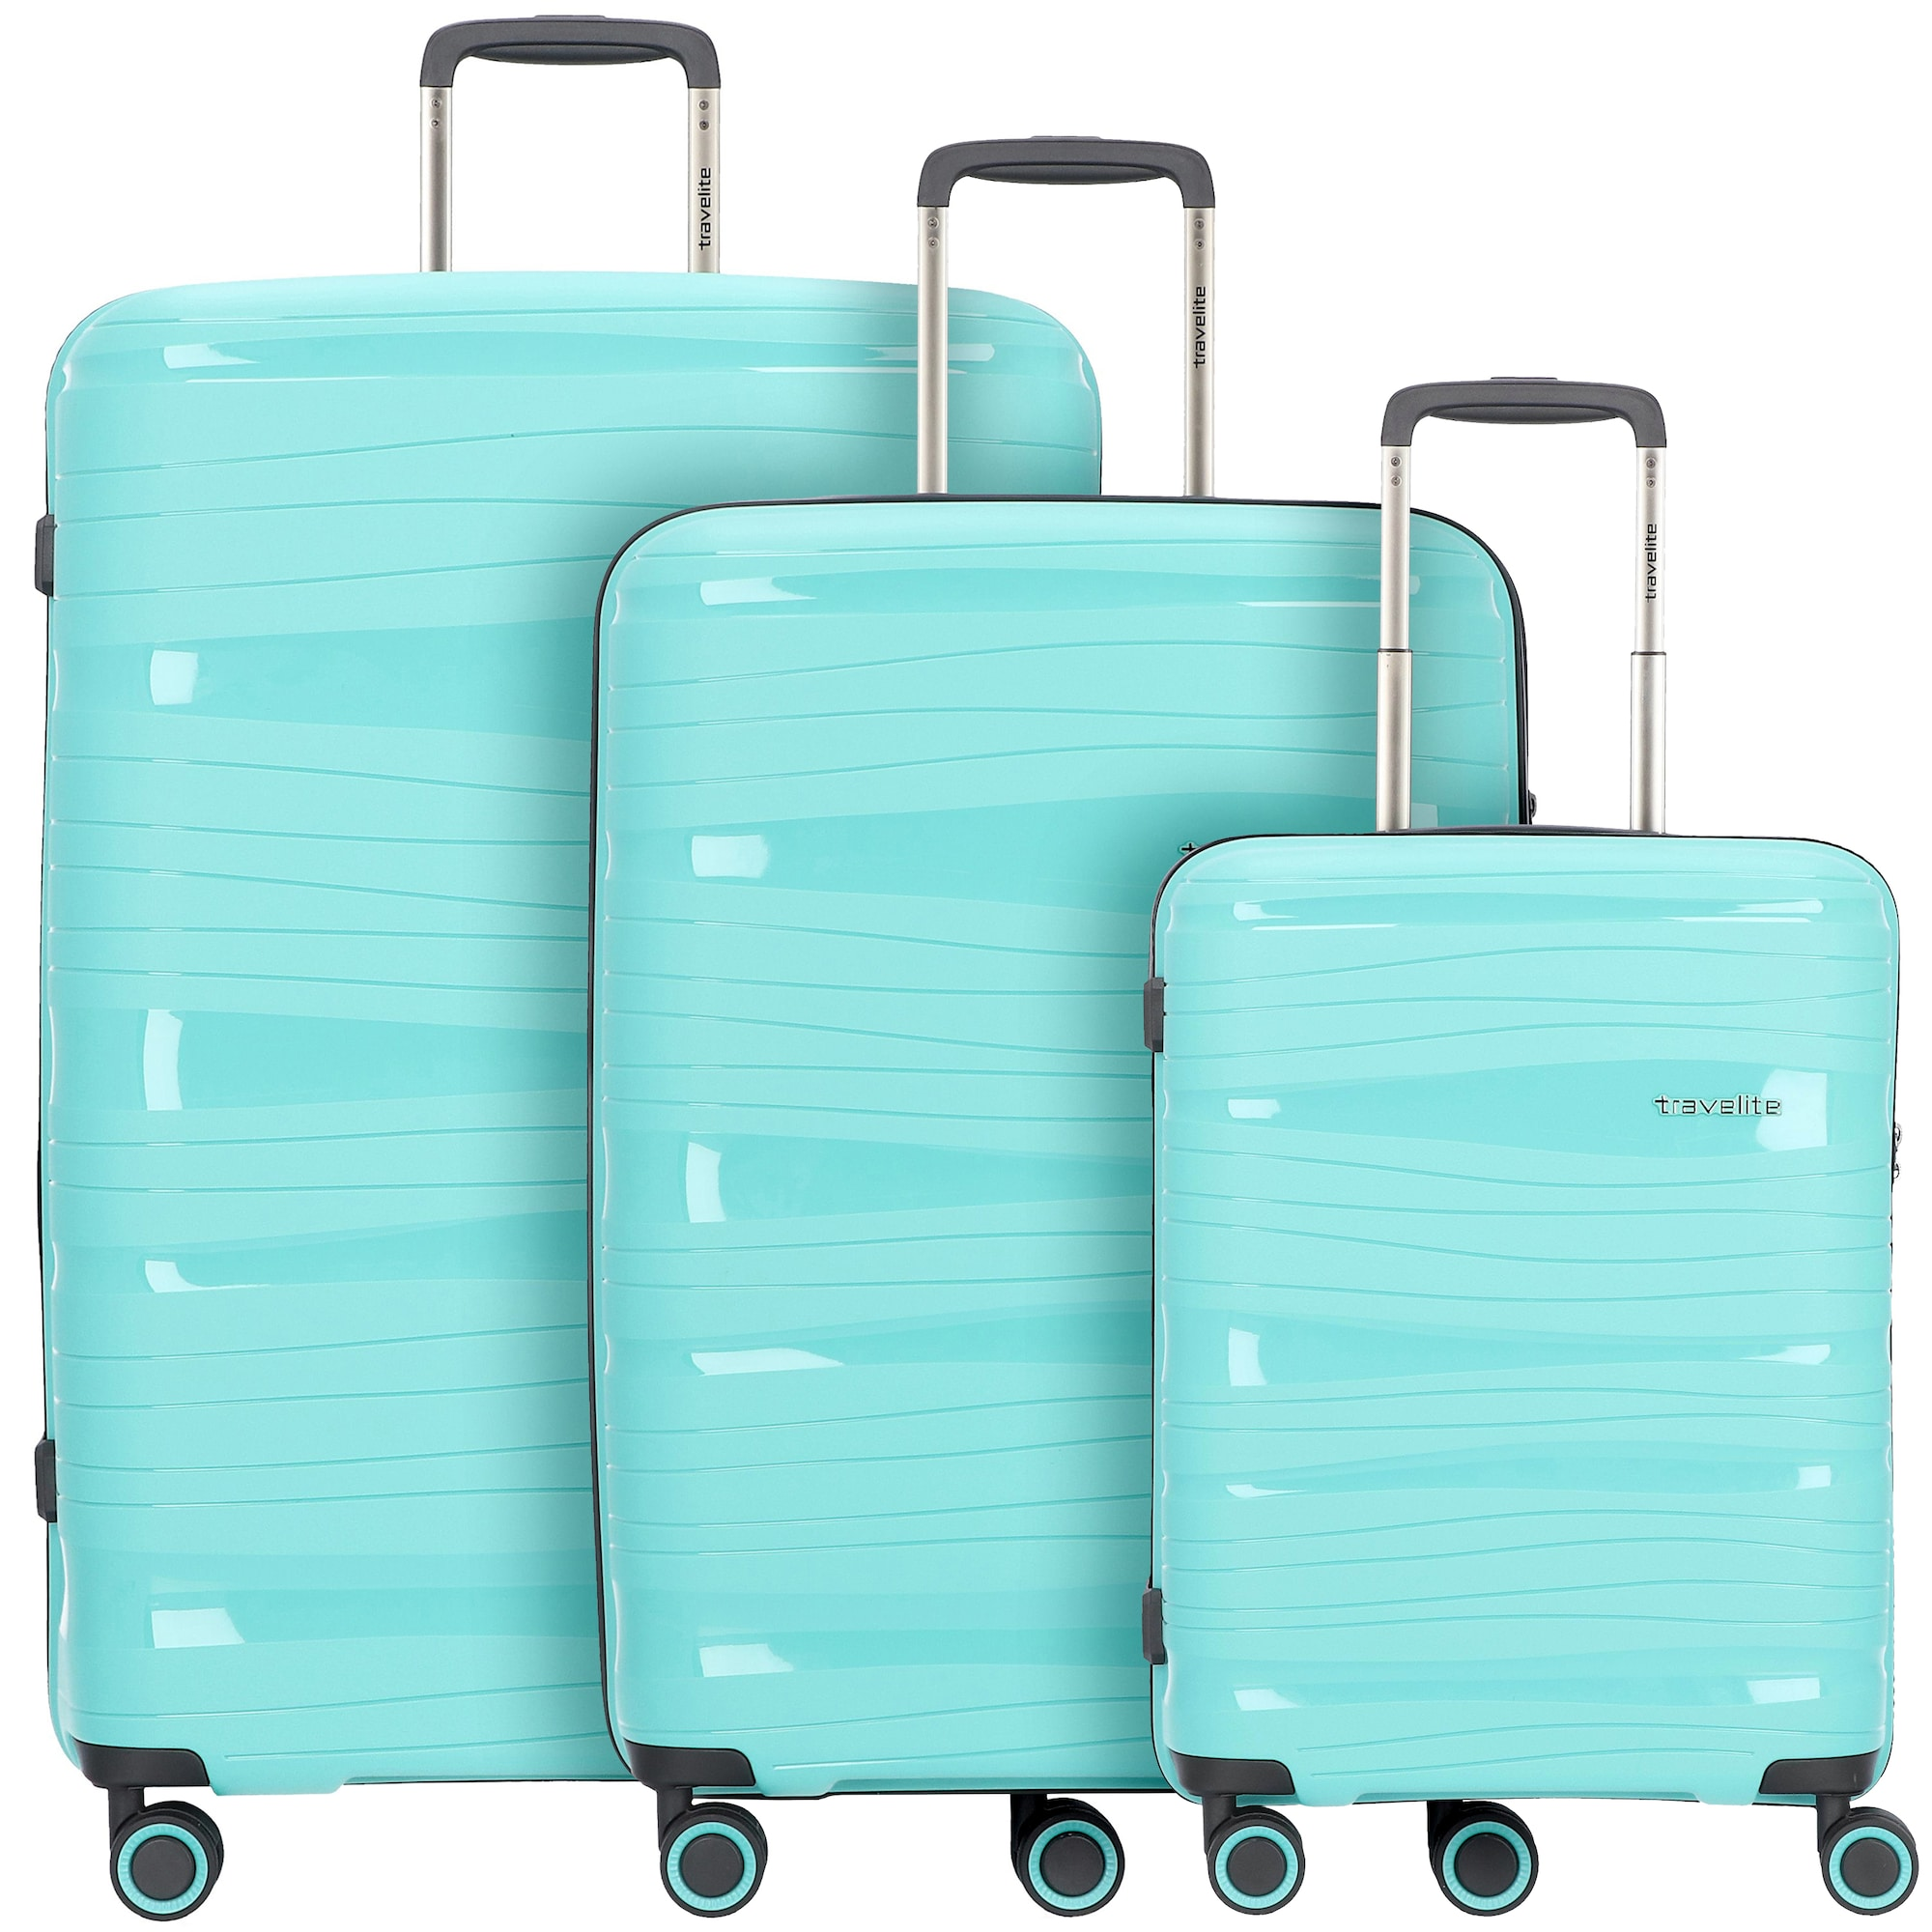 Kofferset 'Motion' | Taschen > Koffer & Trolleys > Koffersets | Travelite